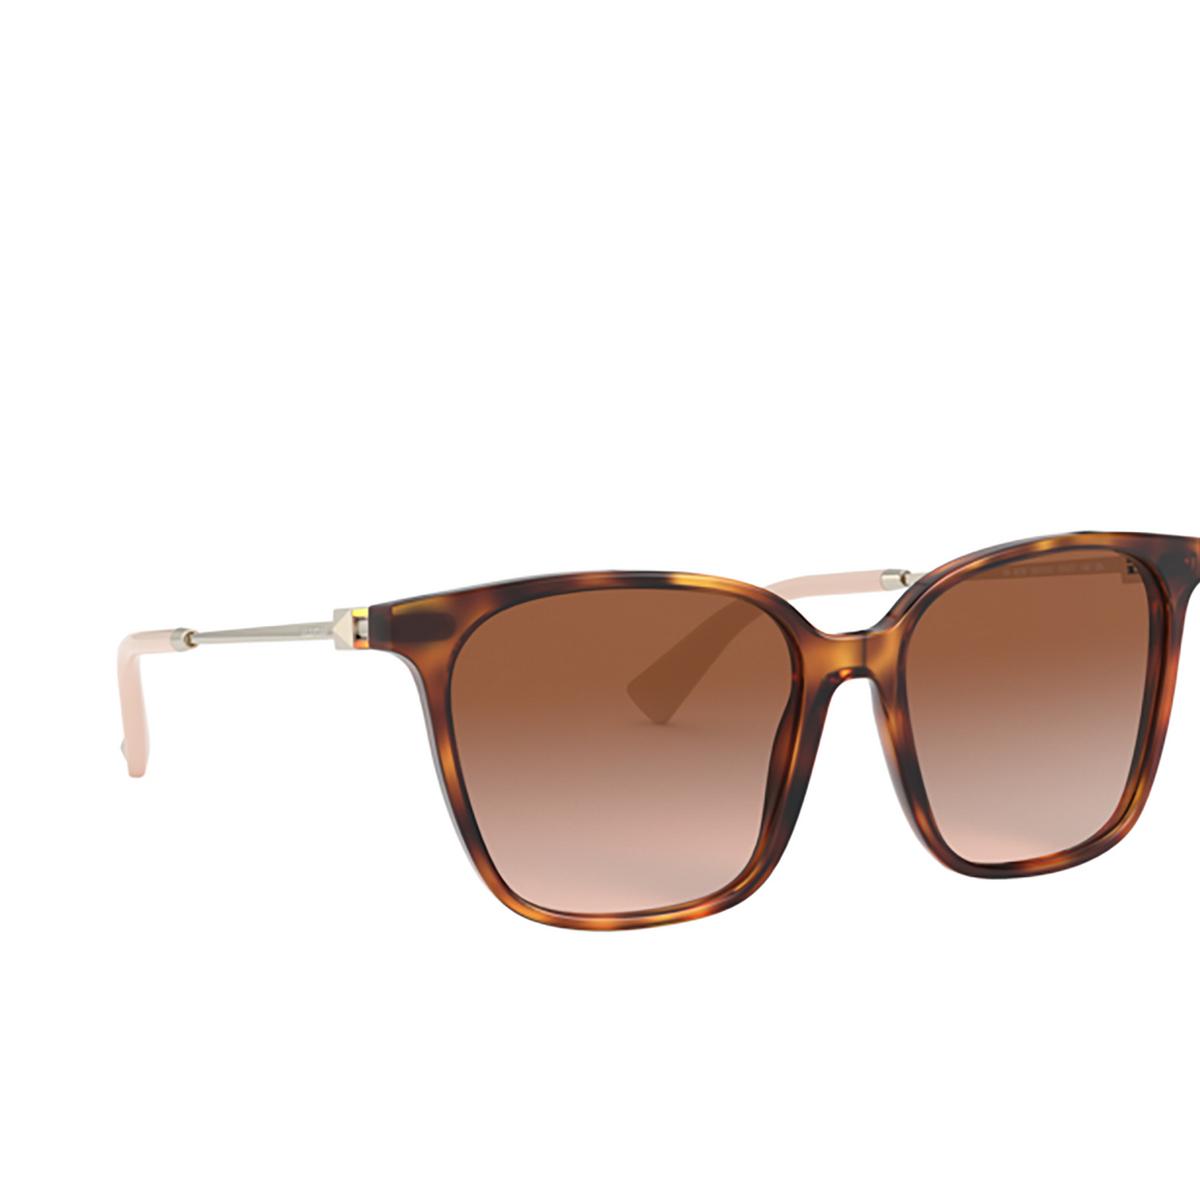 Valentino® Square Sunglasses: VA4078 color Havana 501113 - three-quarters view.